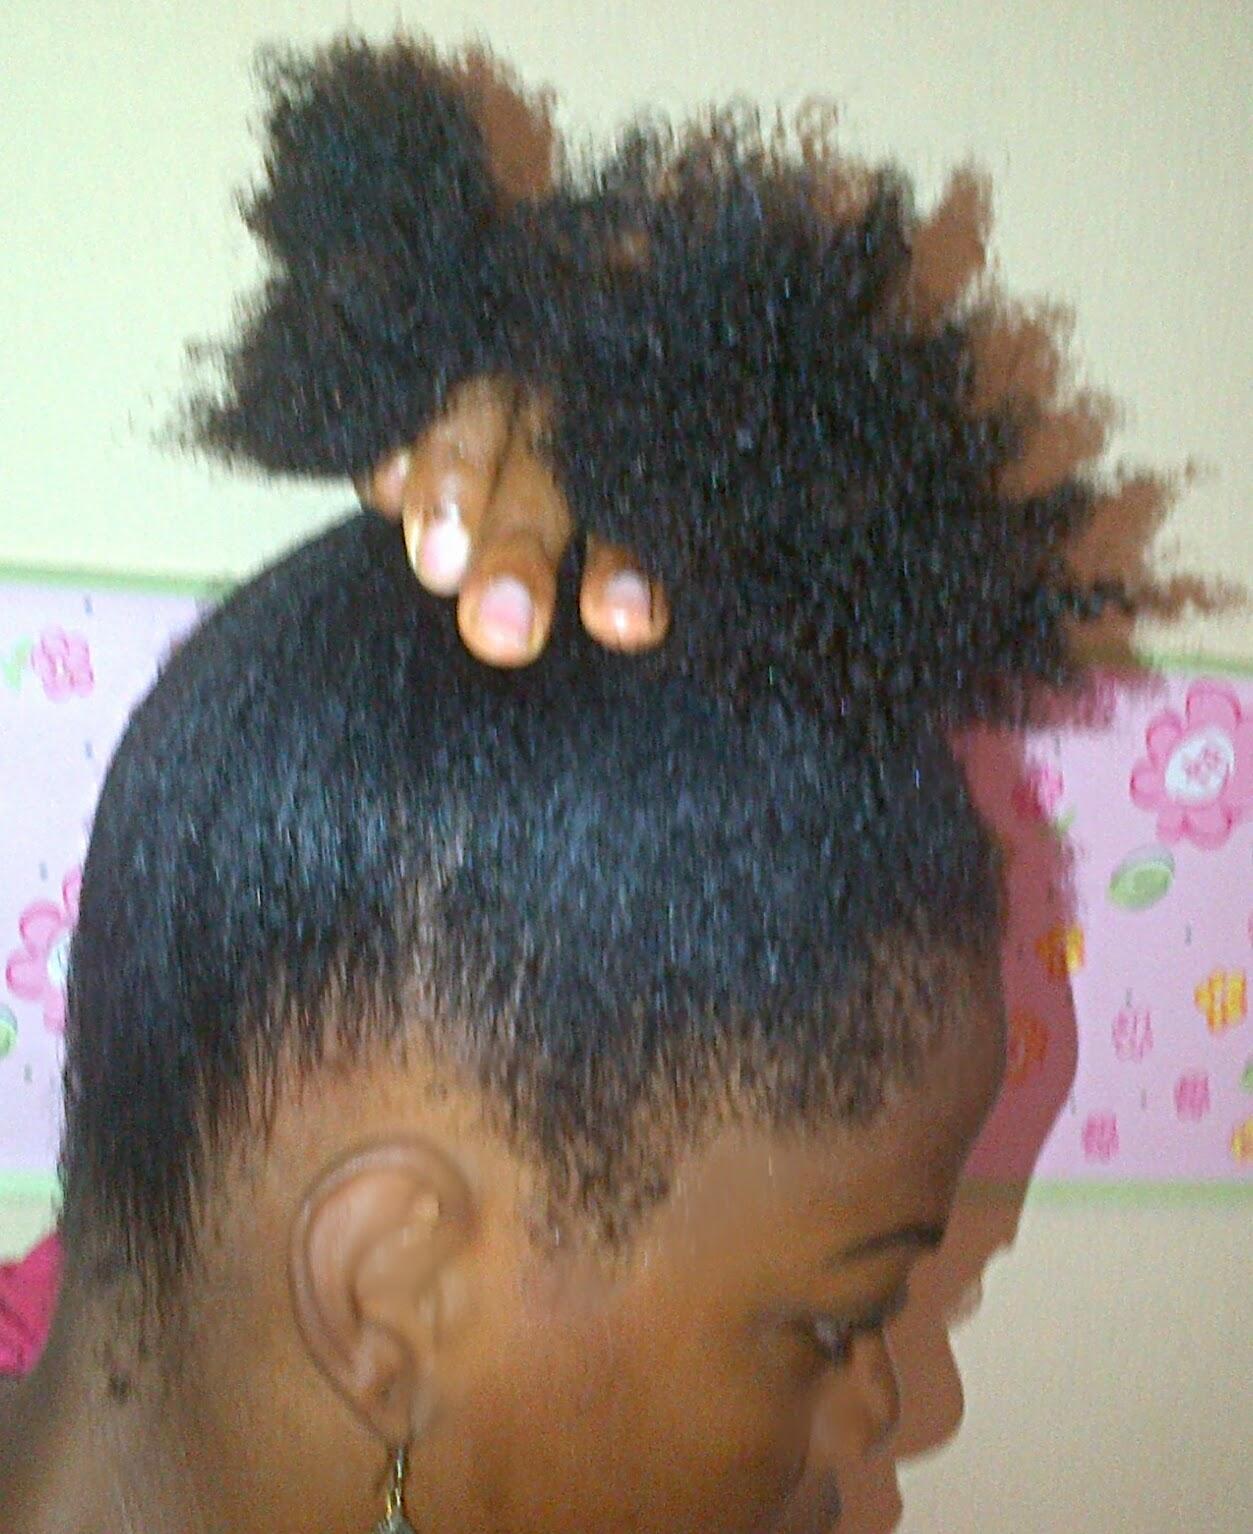 Tremendous Darkchildlovethyhair How To Create A A Sleek Faux Bun With Short Short Hairstyles For Black Women Fulllsitofus